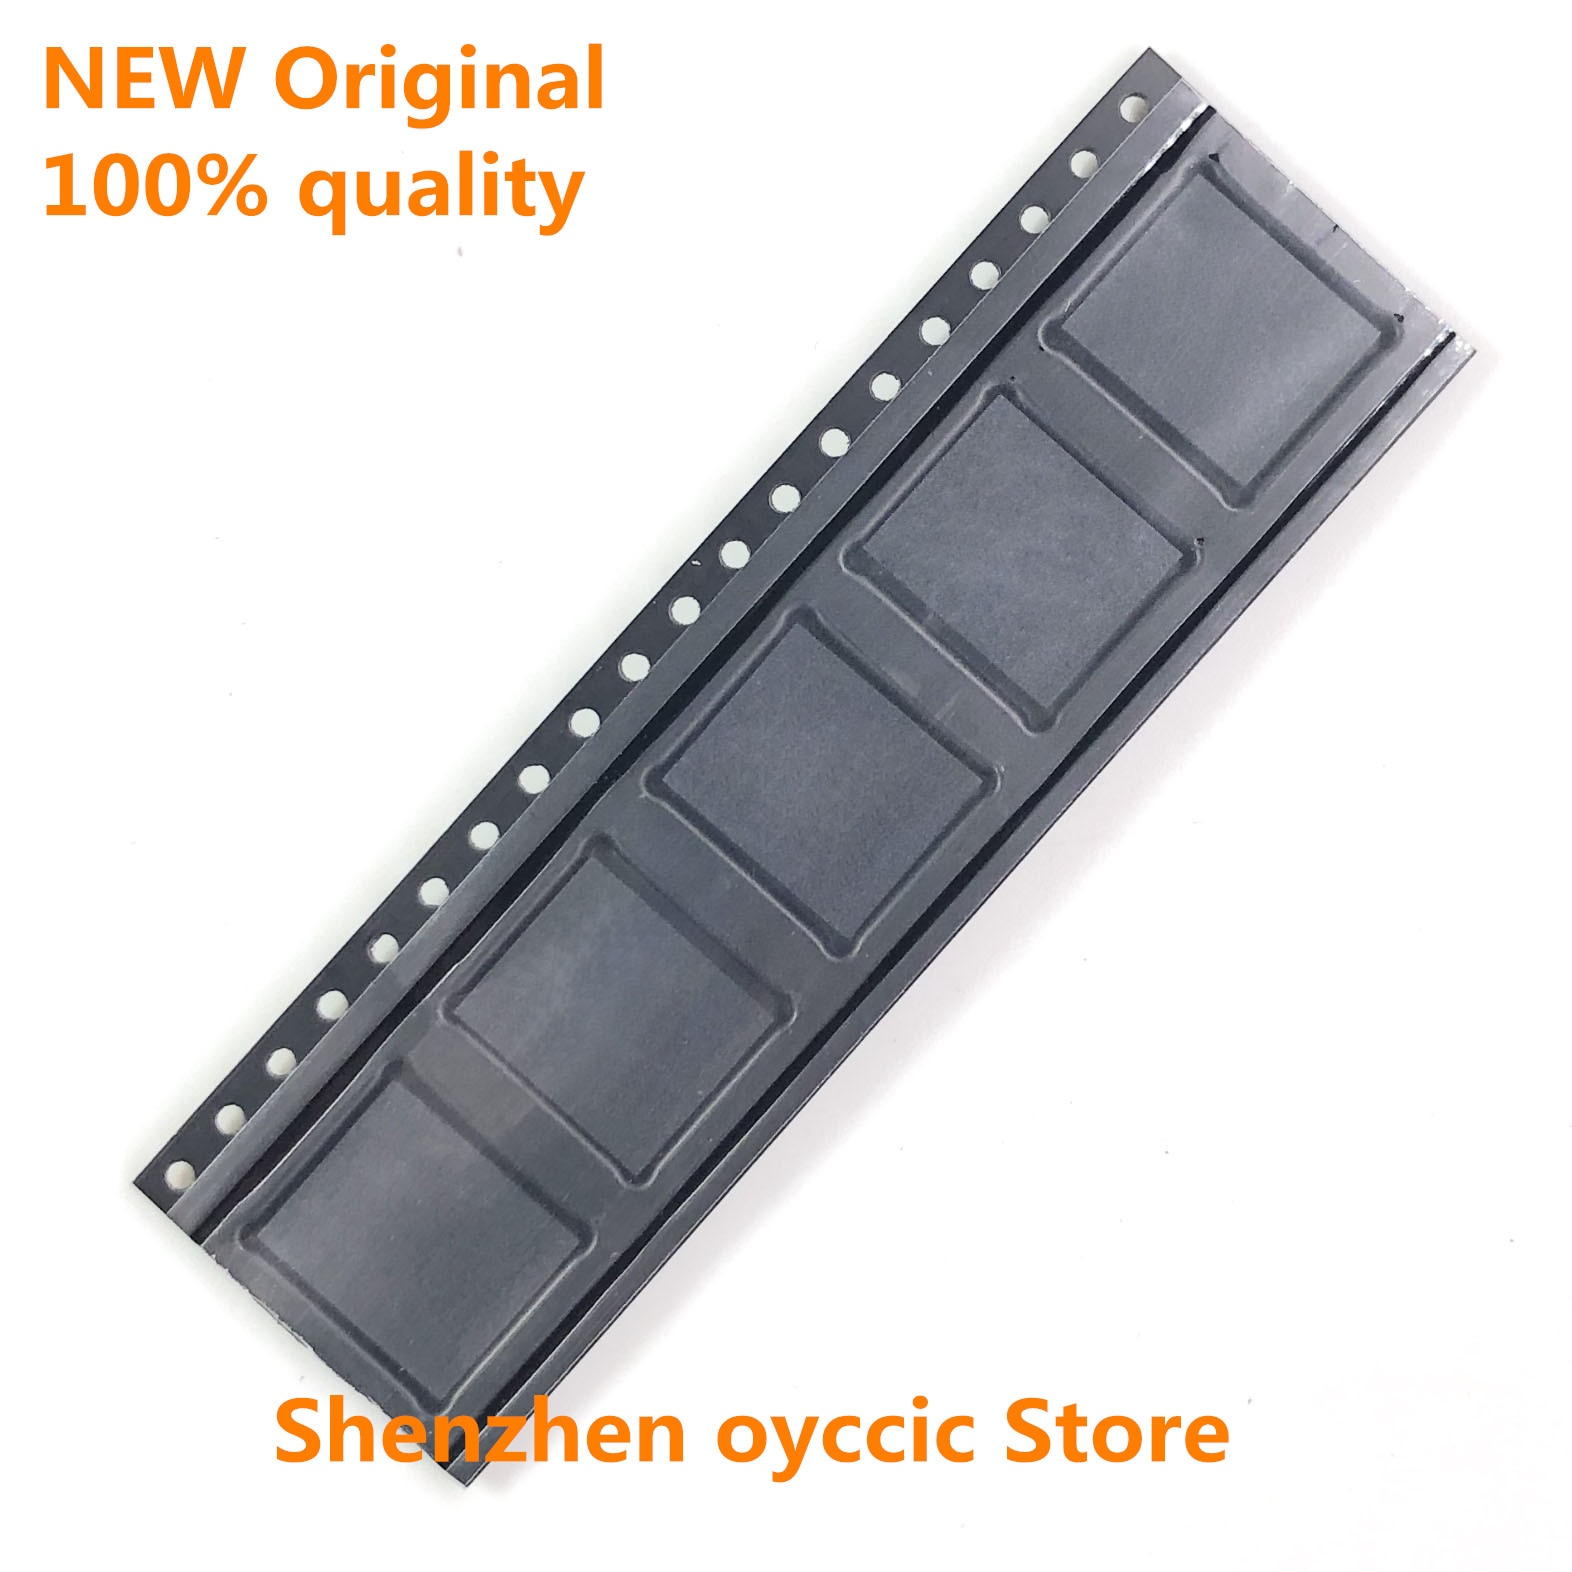 10 Uds * Nuevo BM1387 QFN IC Chipset